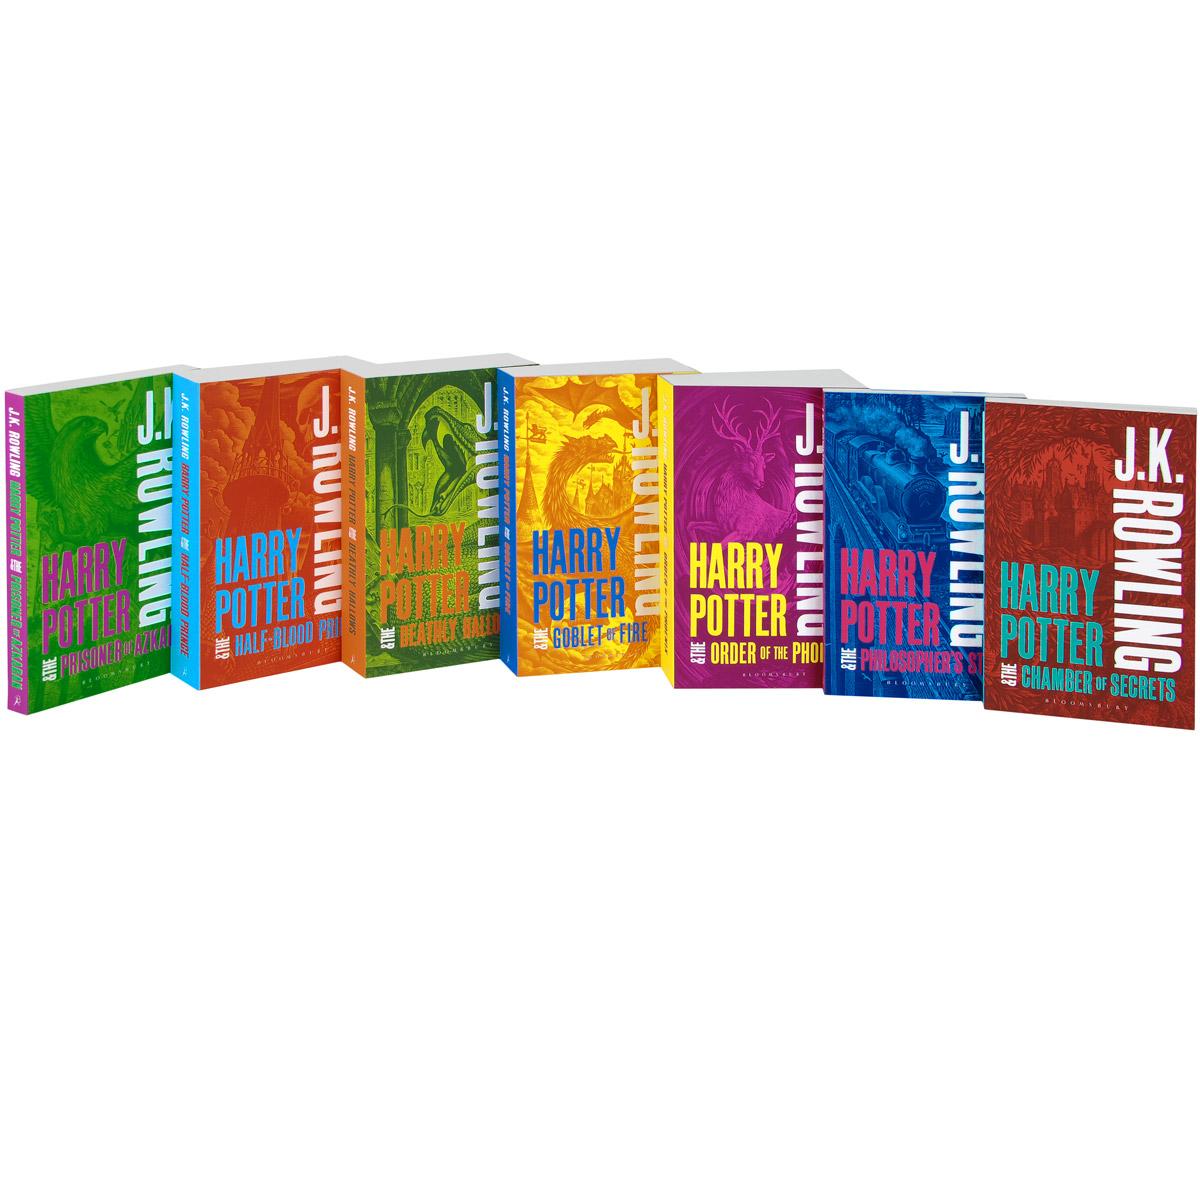 Harry Potter: The Complete Collection (комплект из 7 книг)